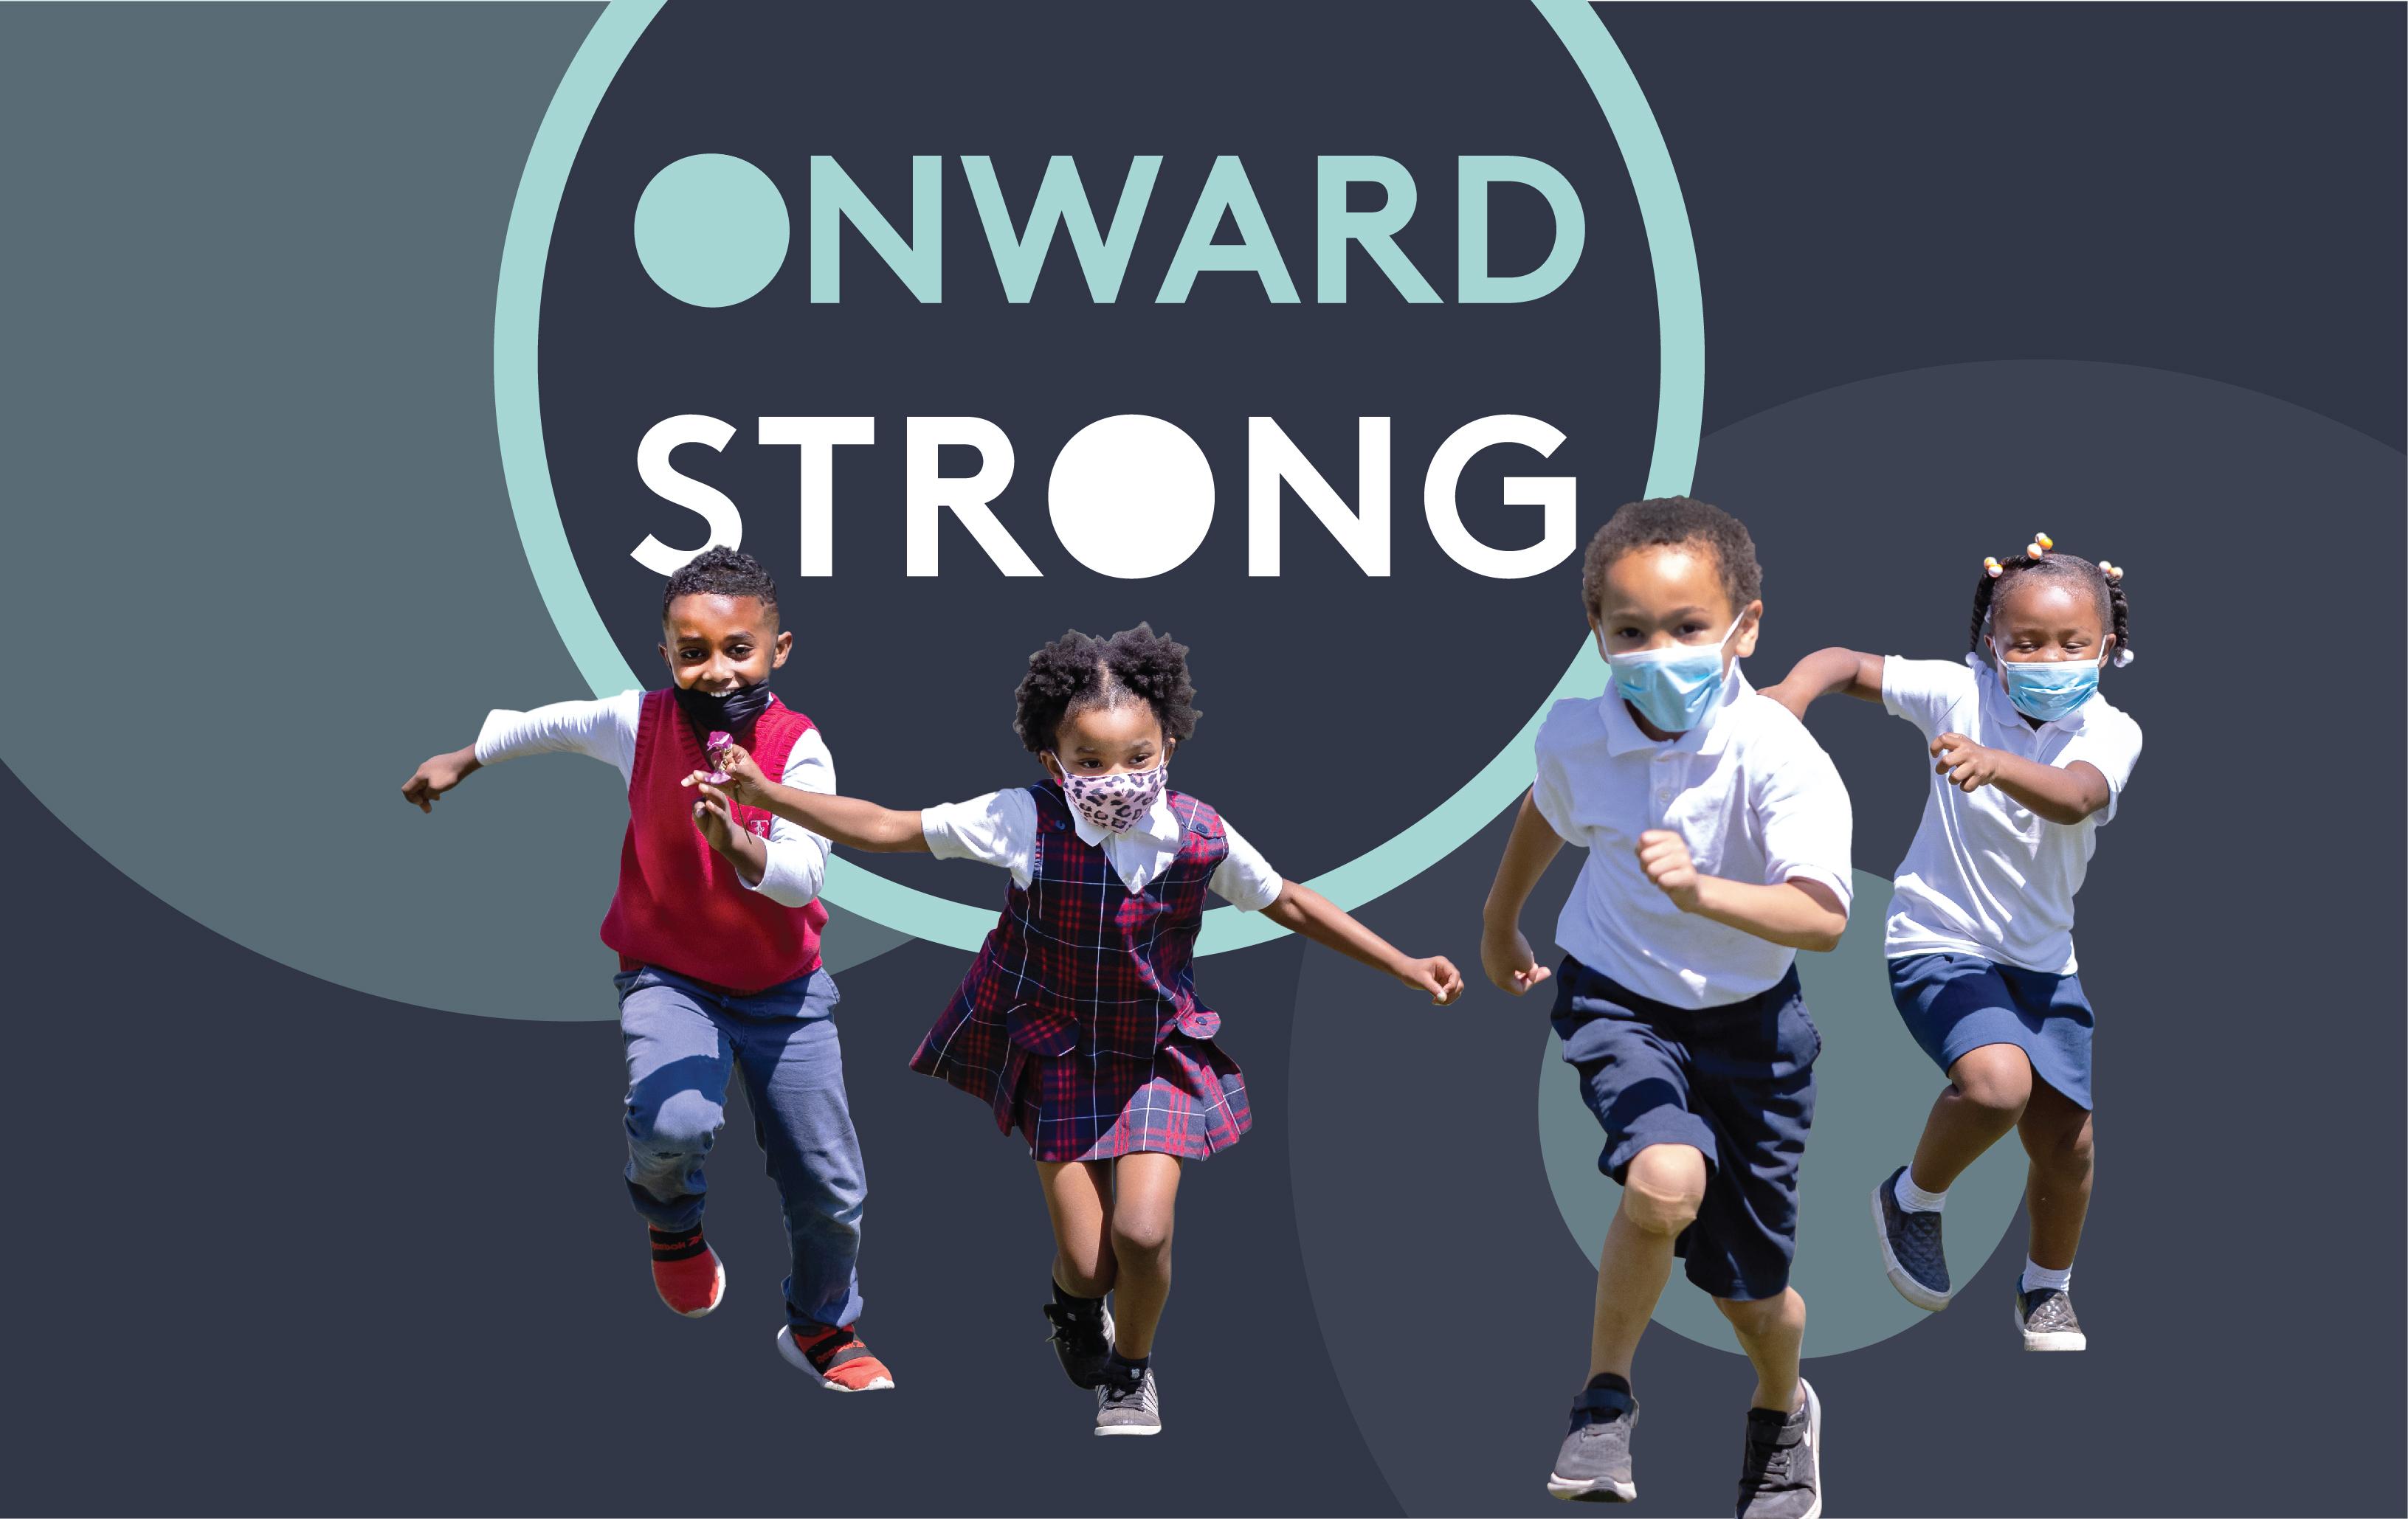 Onward Strong logo with kids running